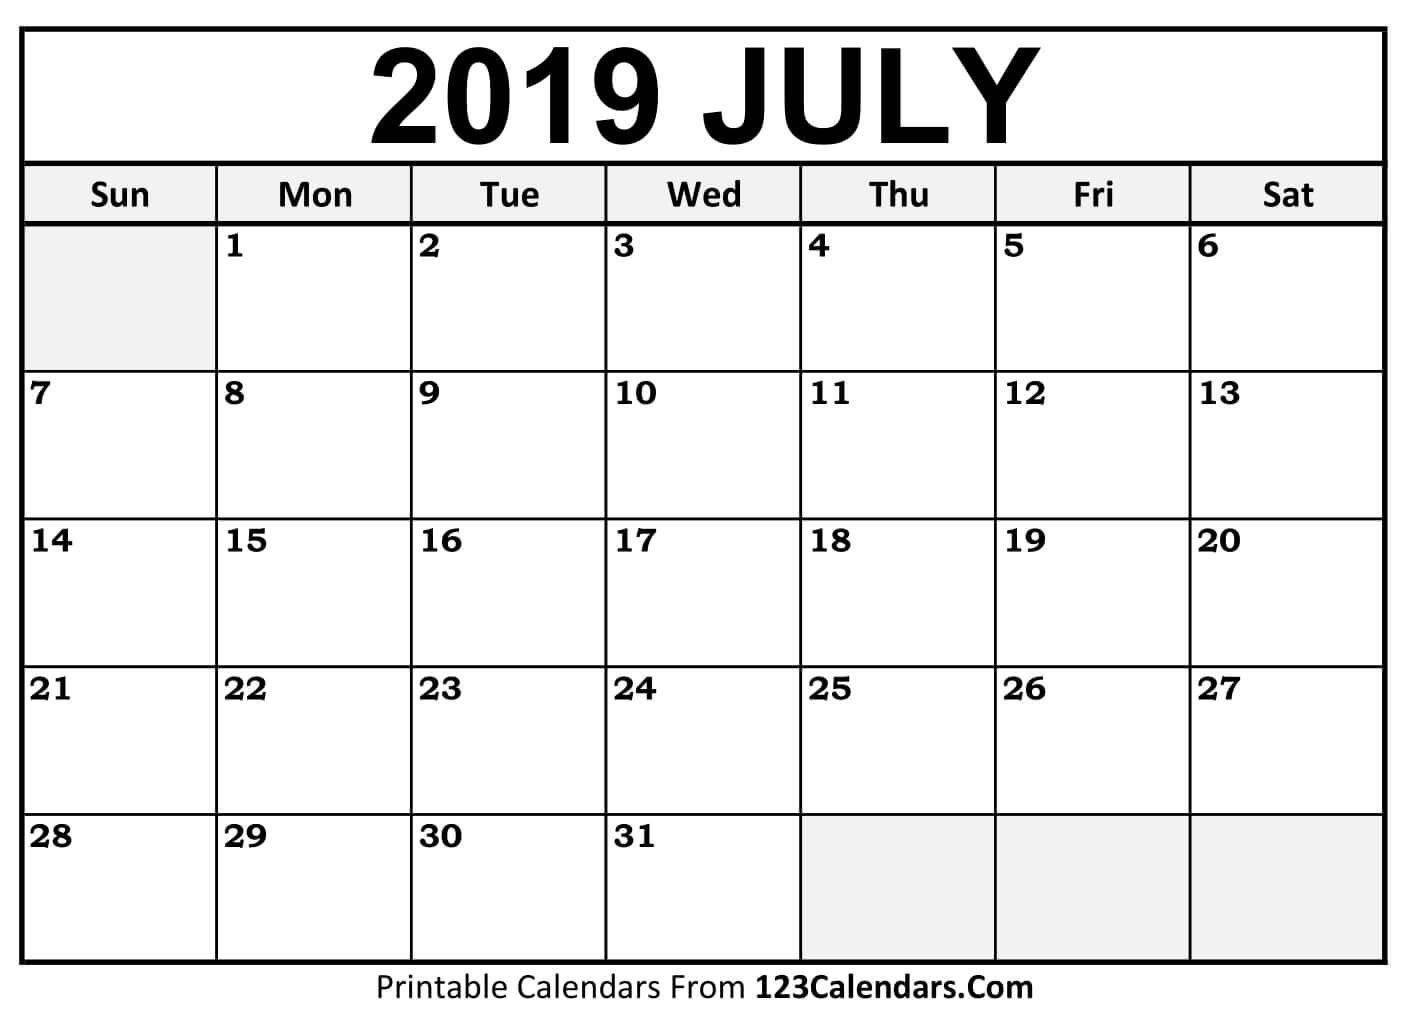 Printable July 2019 Calendar Templates – 123Calendars July 2 2019 Calendar